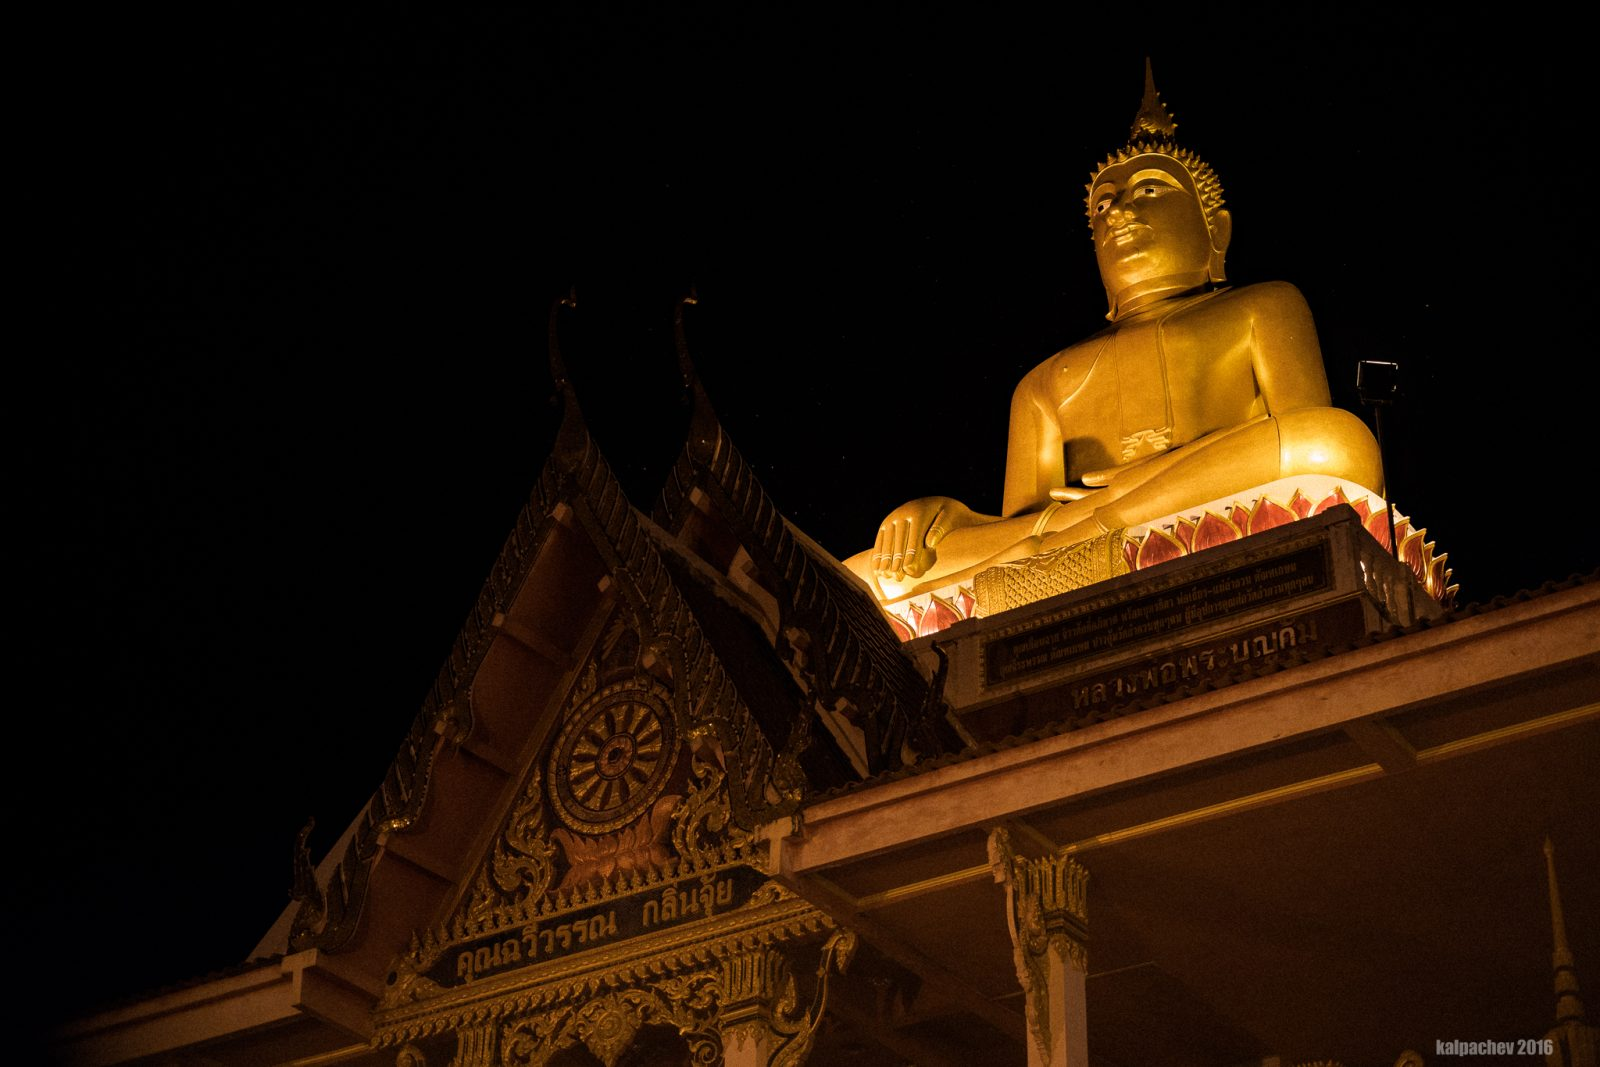 Nong Khai, Thailand. October 2016